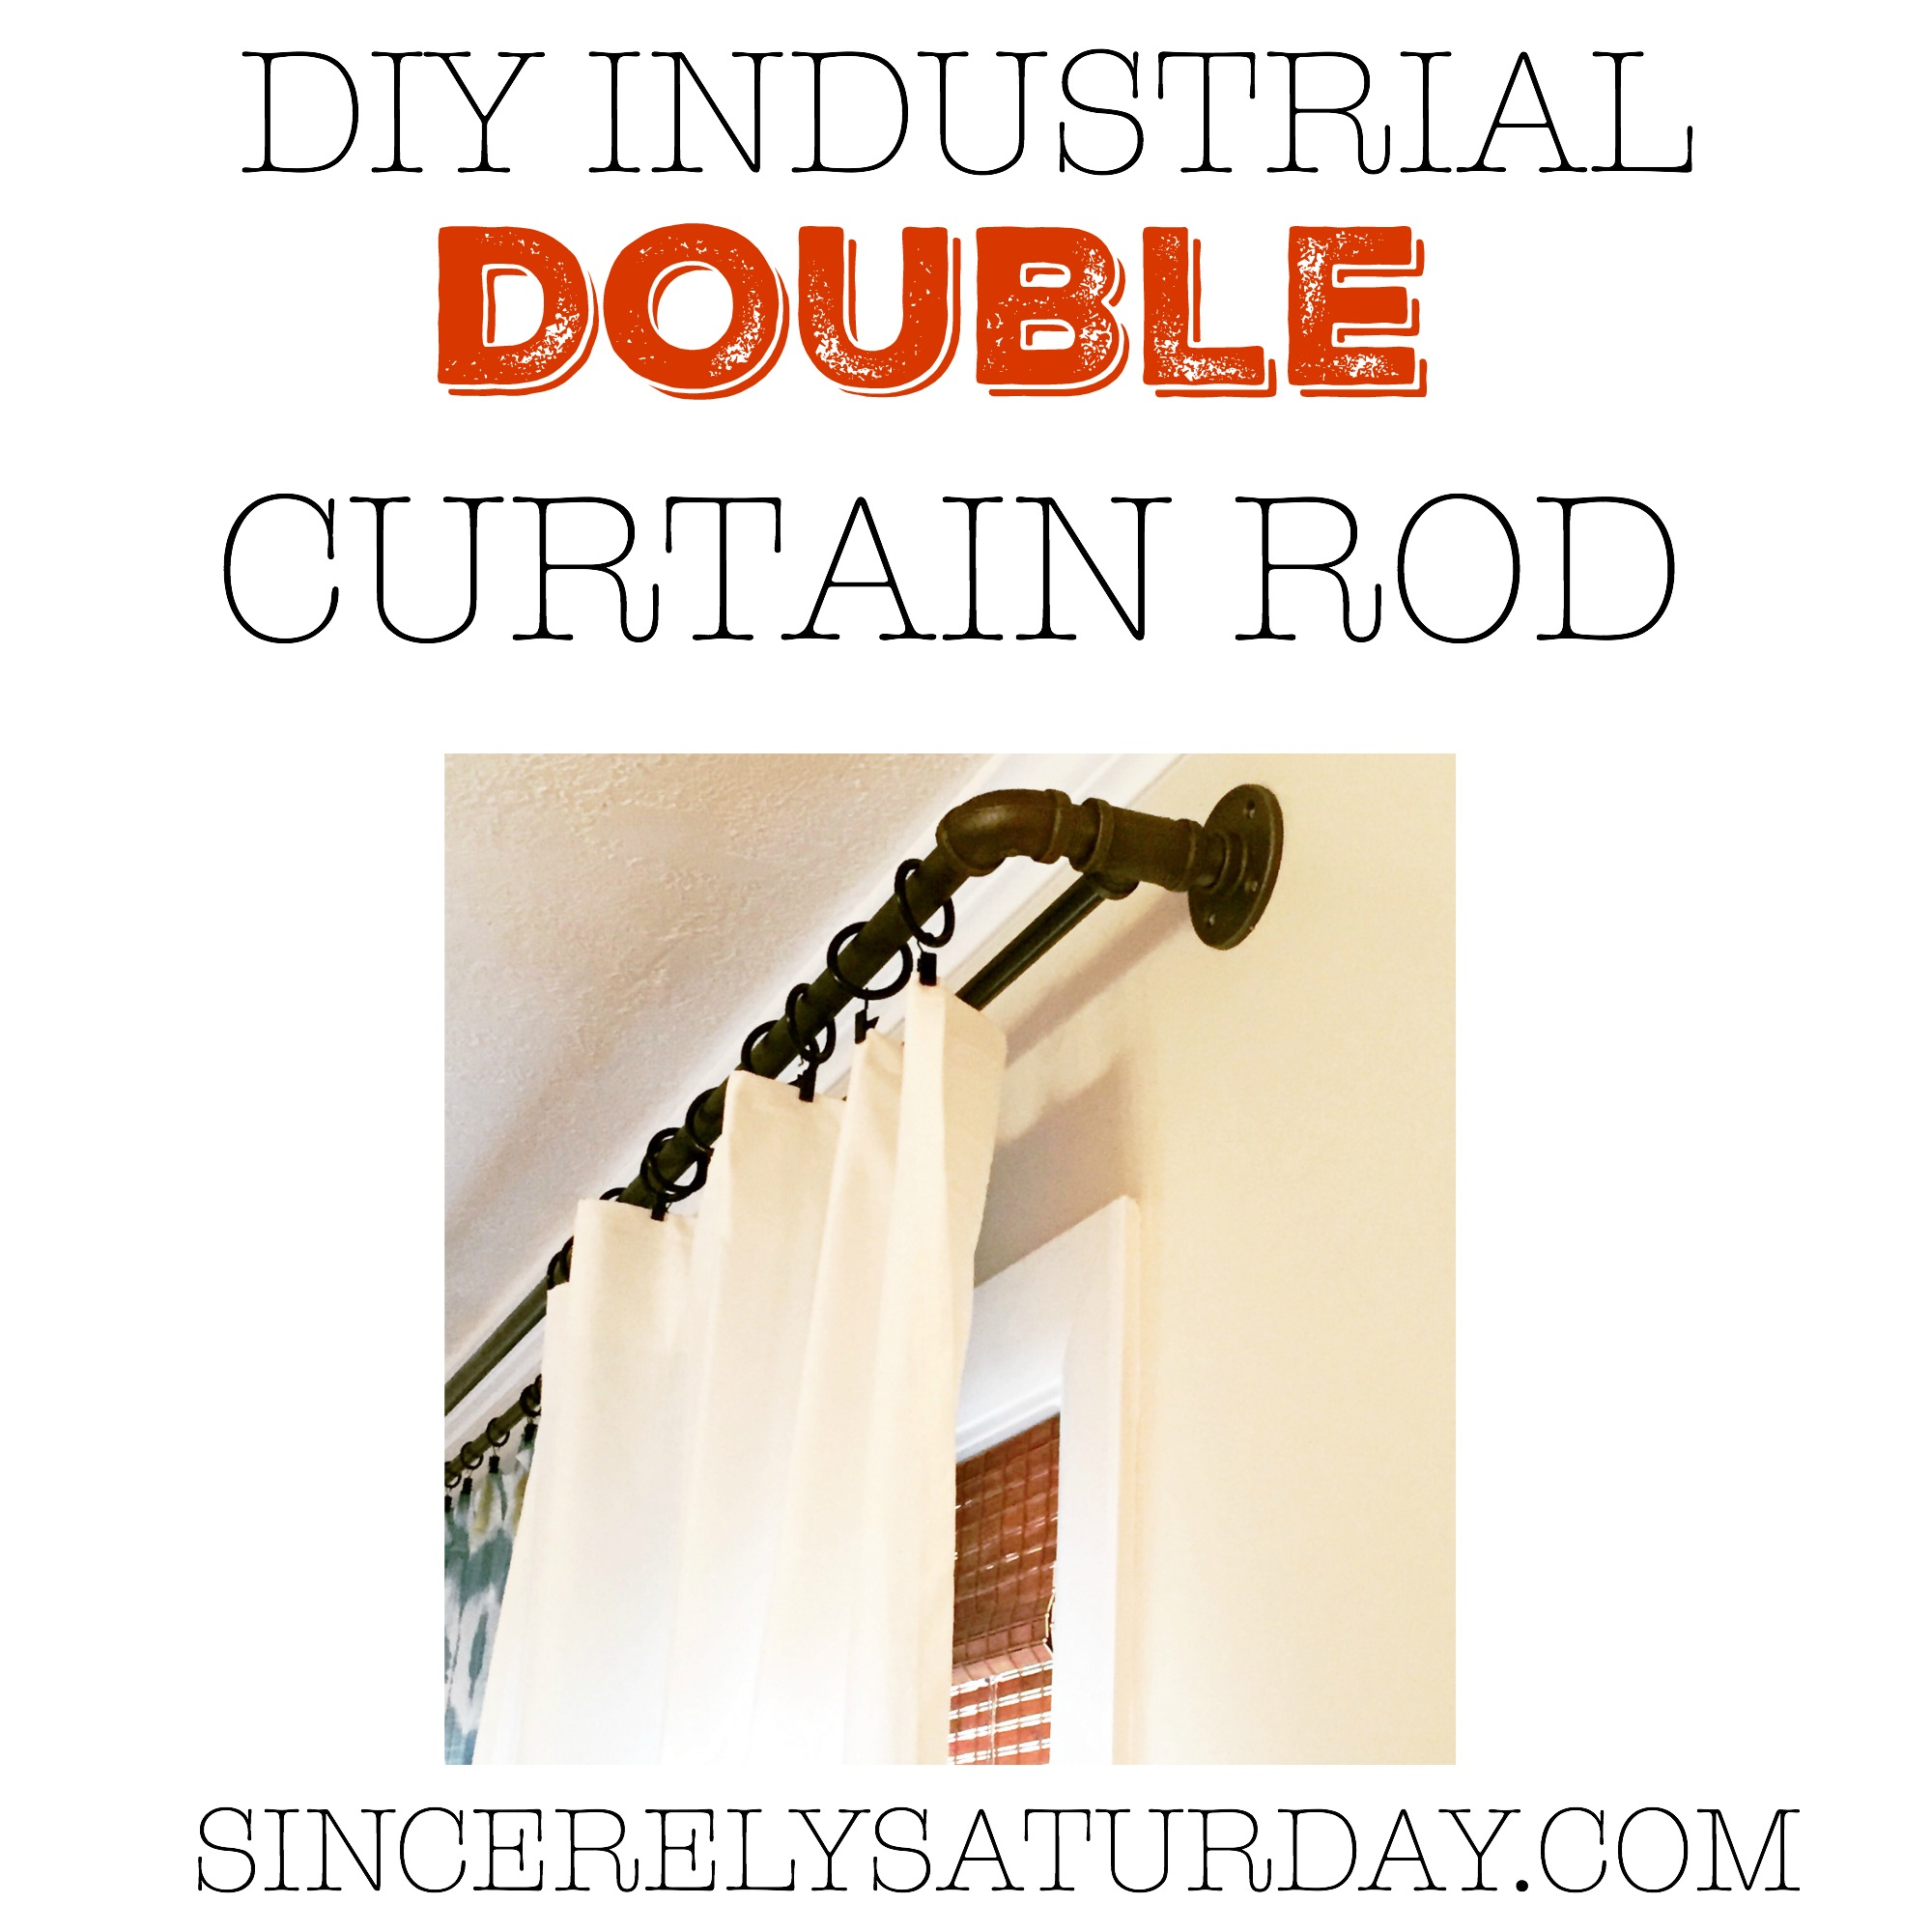 Diy Industrial Double Conduit Curtain Rod Sincerely Saturday